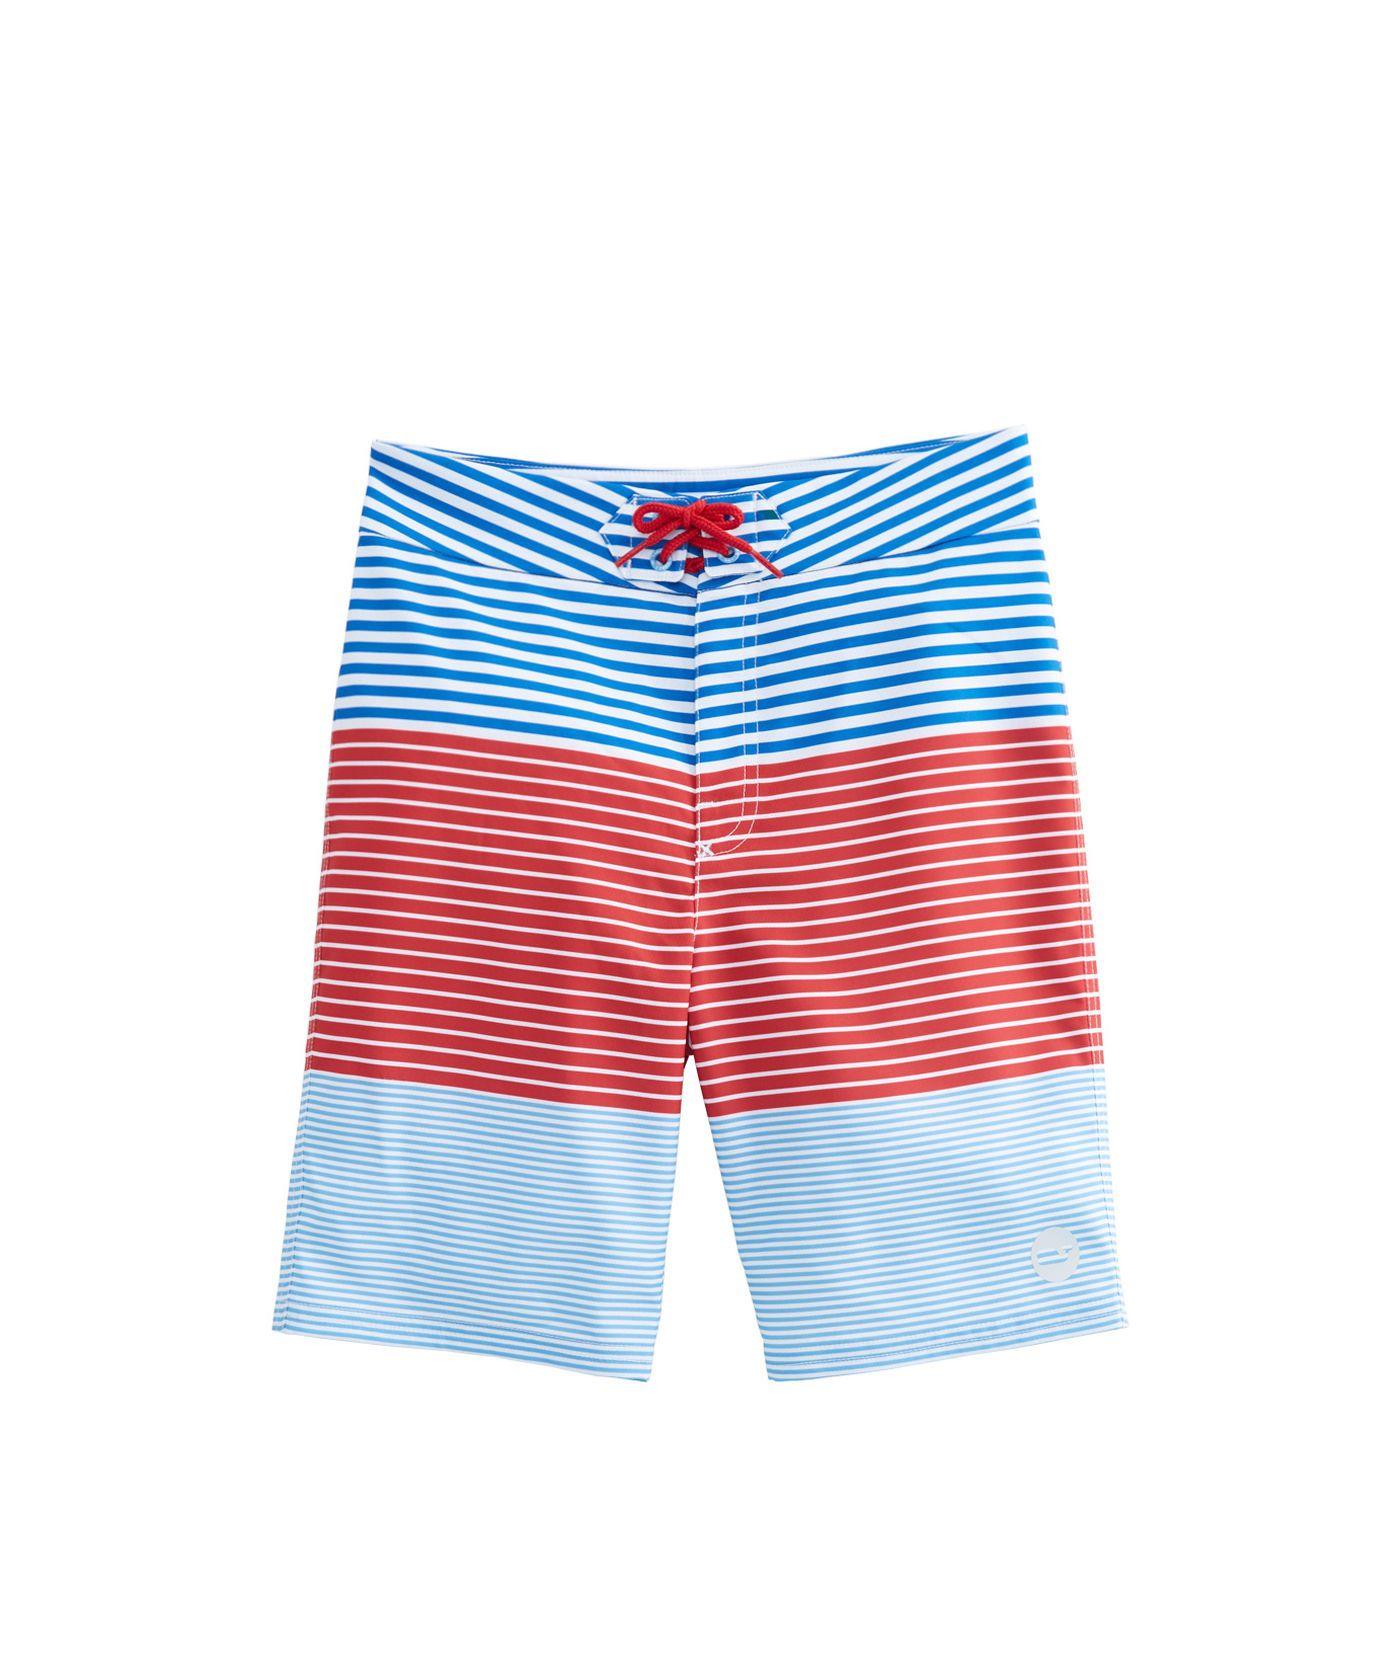 28c5b25411 Boys Whale Harbor Stripe Board Shorts   Treygan & Greydon   Boys ...